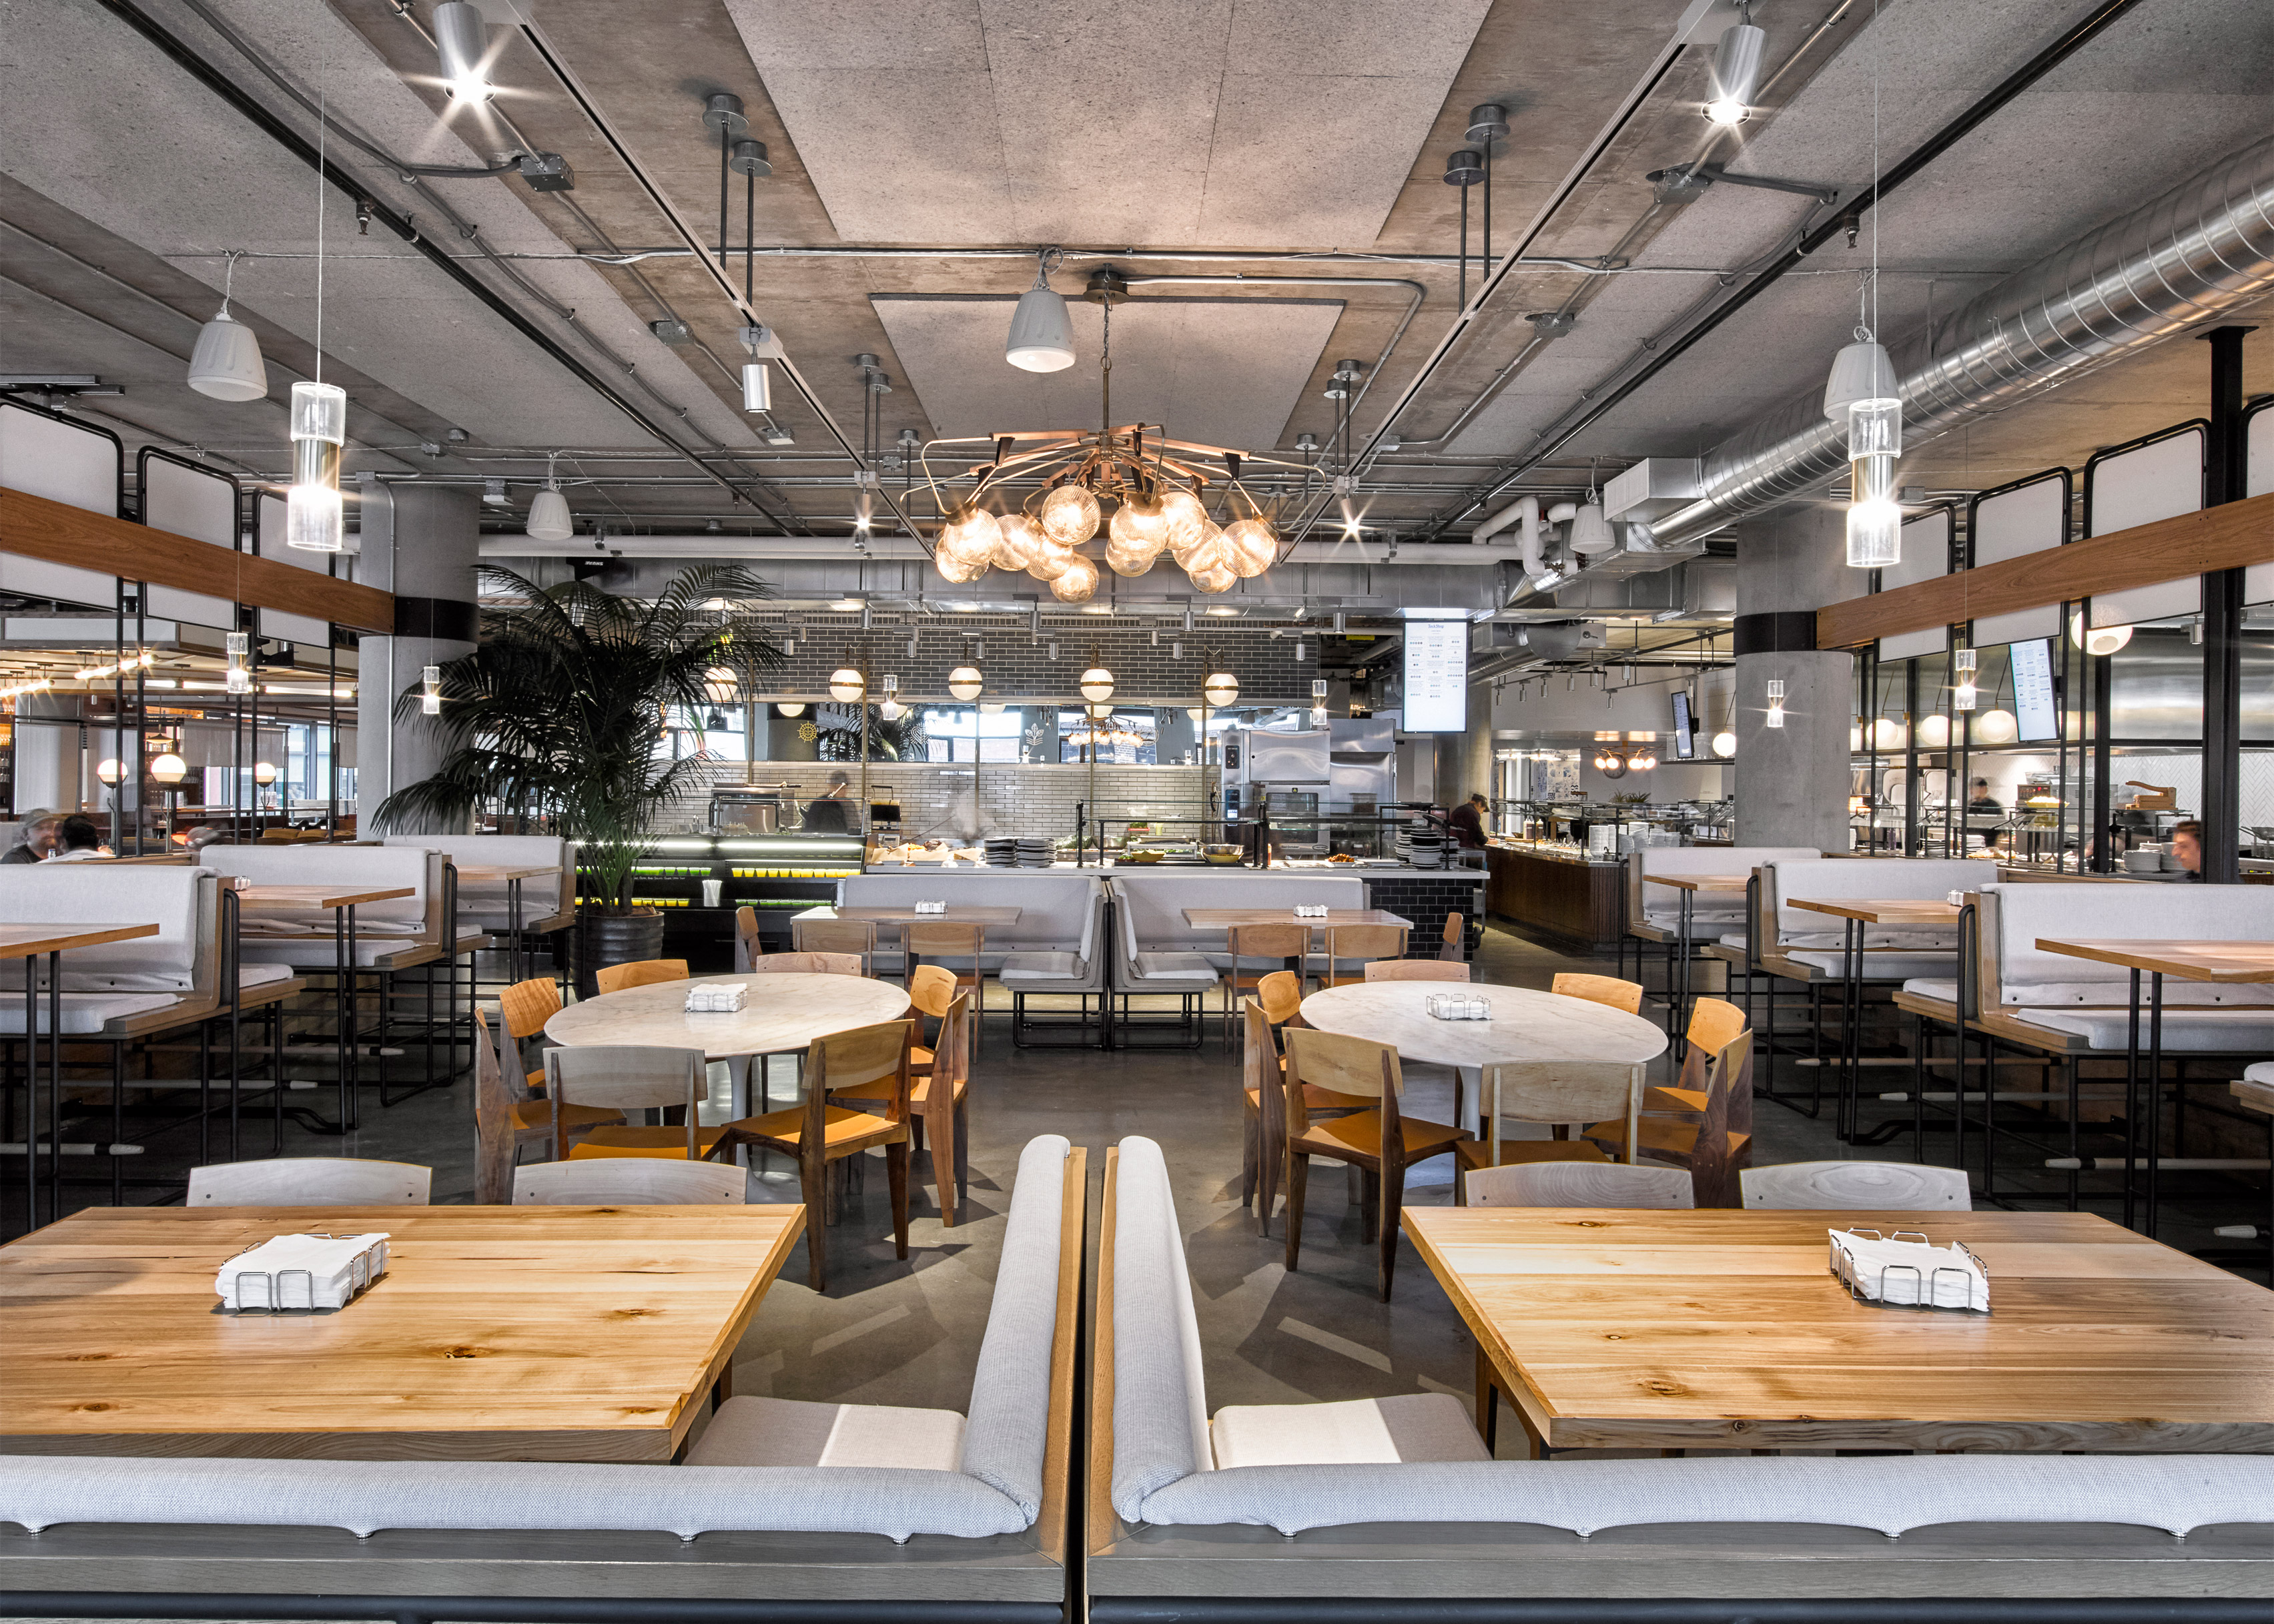 Dropbox Headquarters Café by Avroko